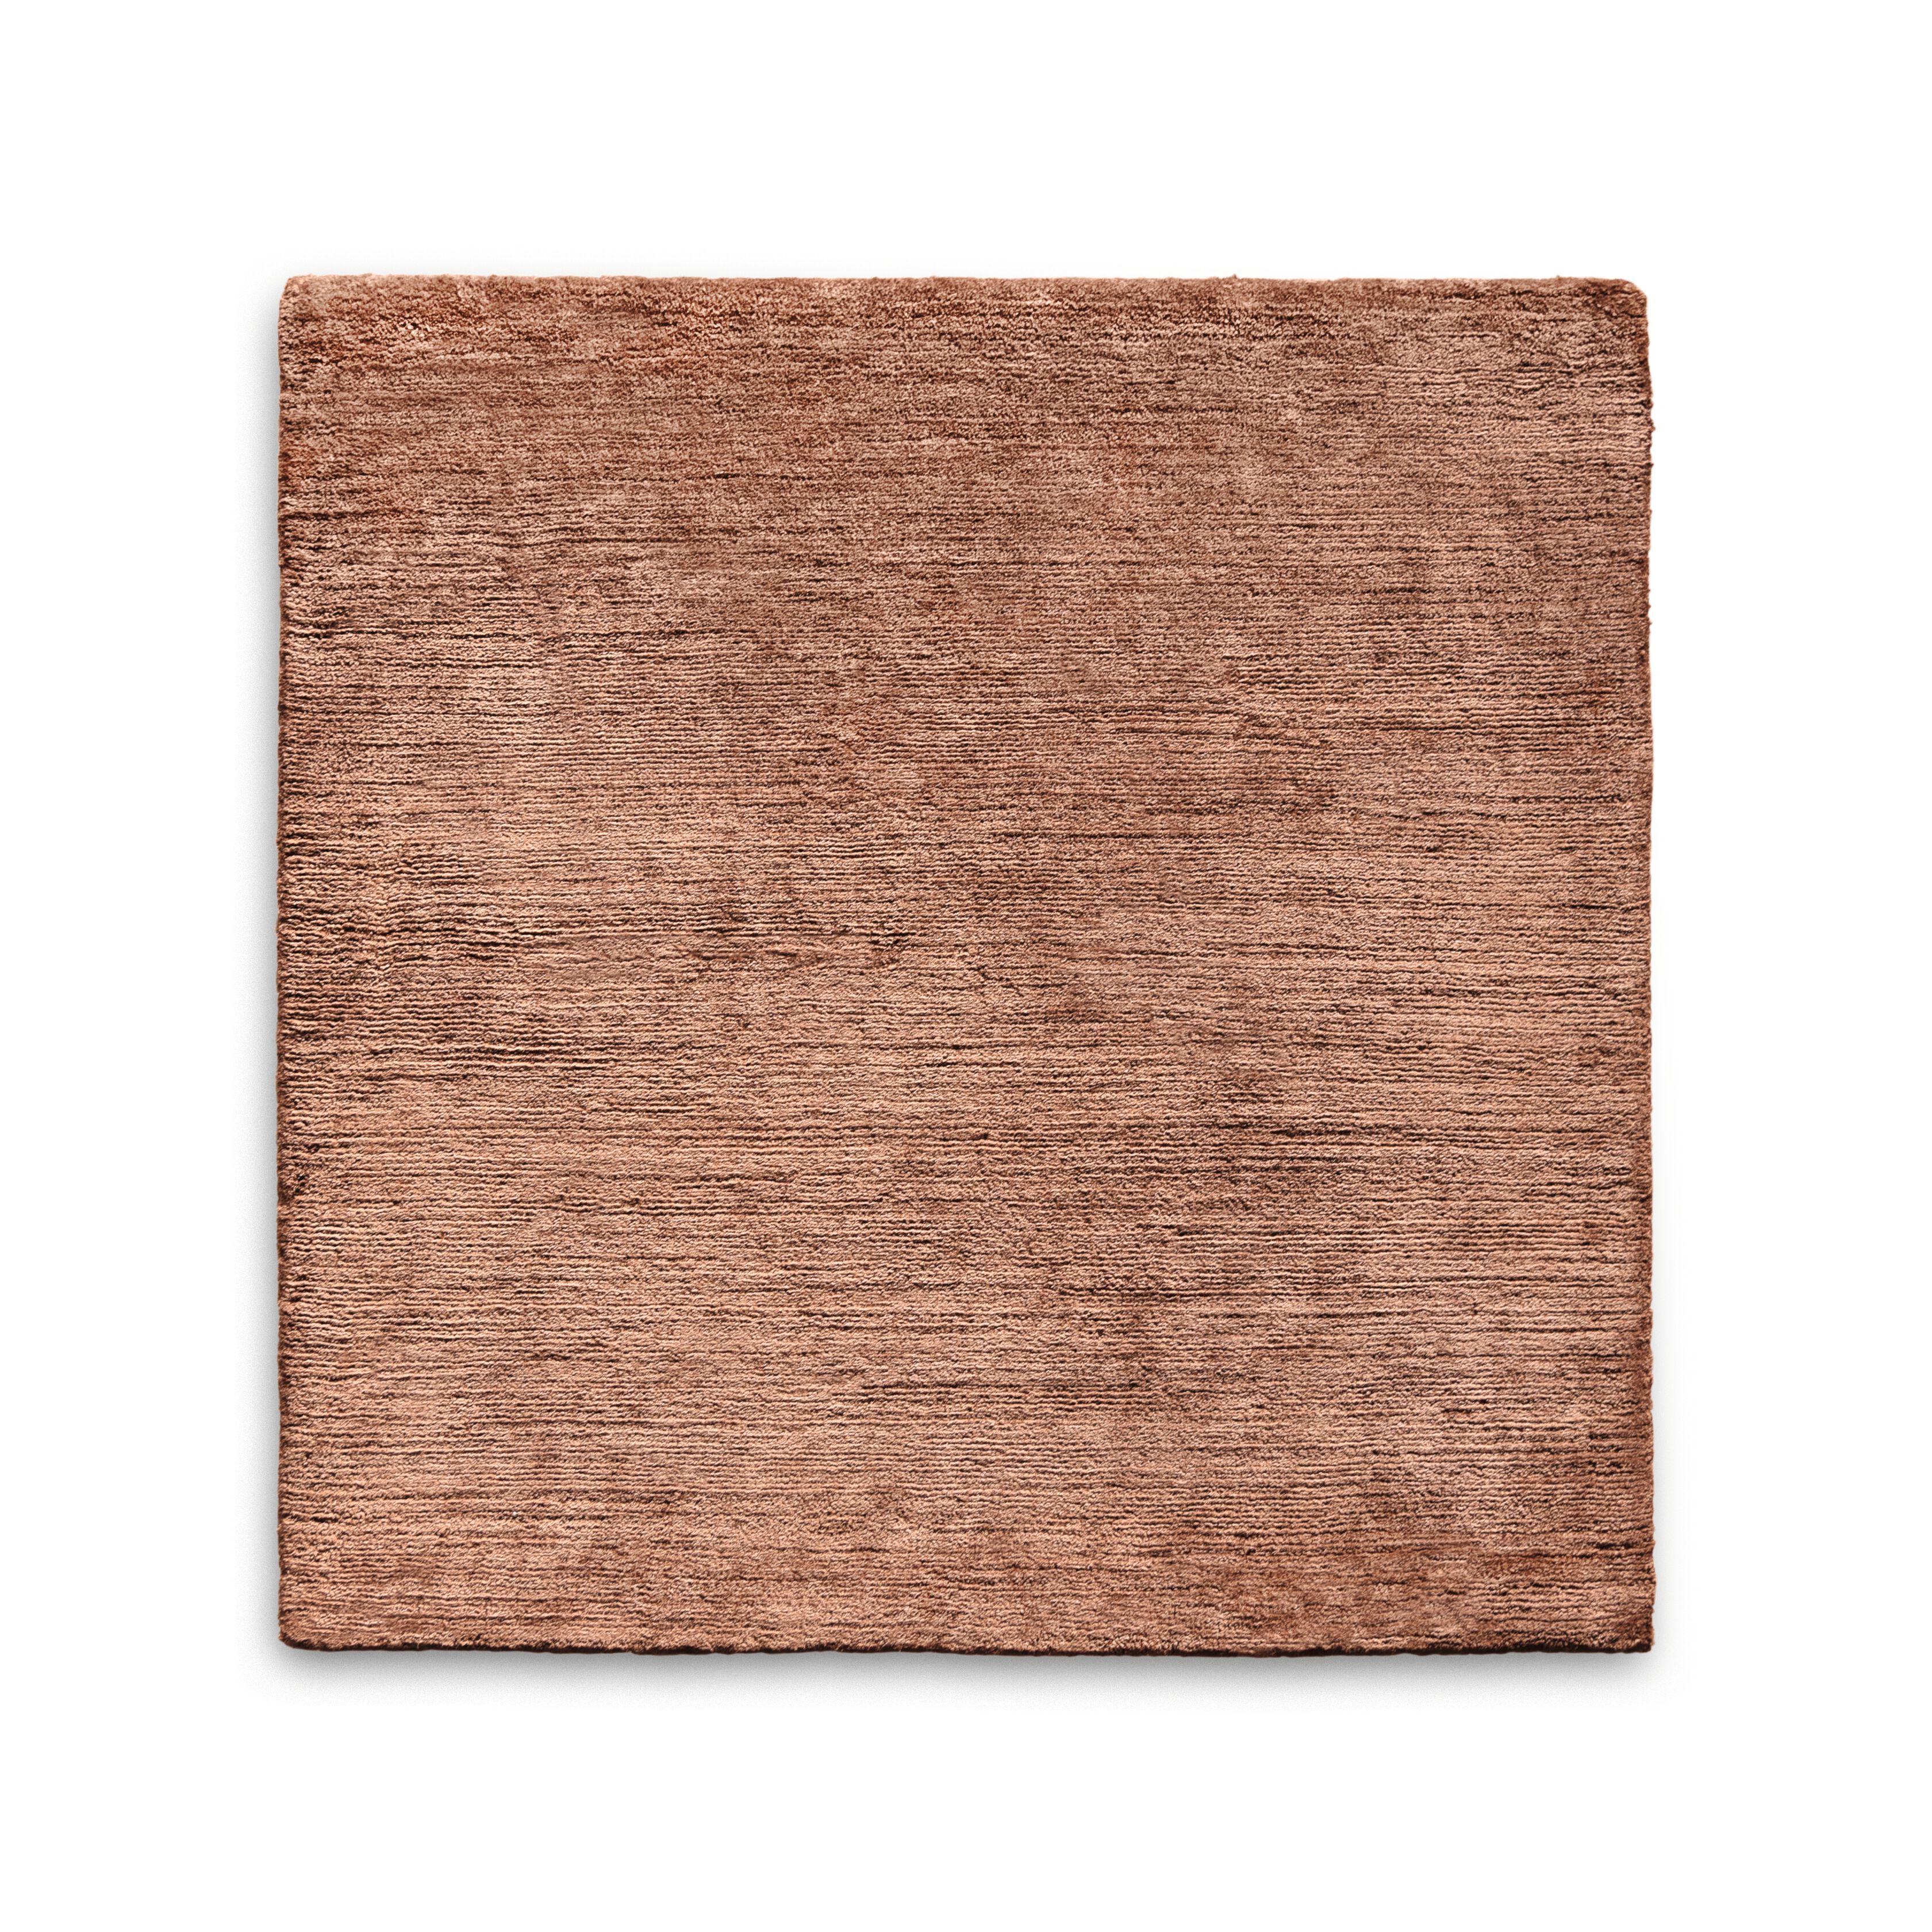 01-WK-Legends_of_carpets-Tumalini-0002-H.tif